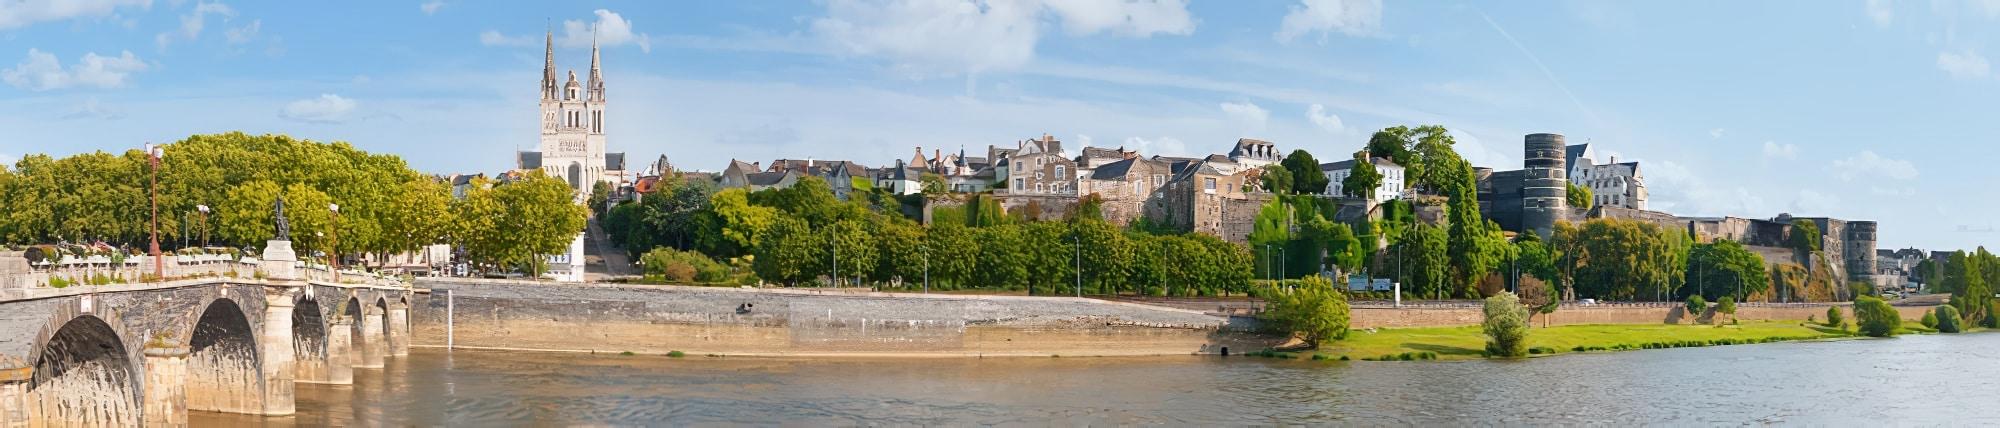 Angers - Mise en avant